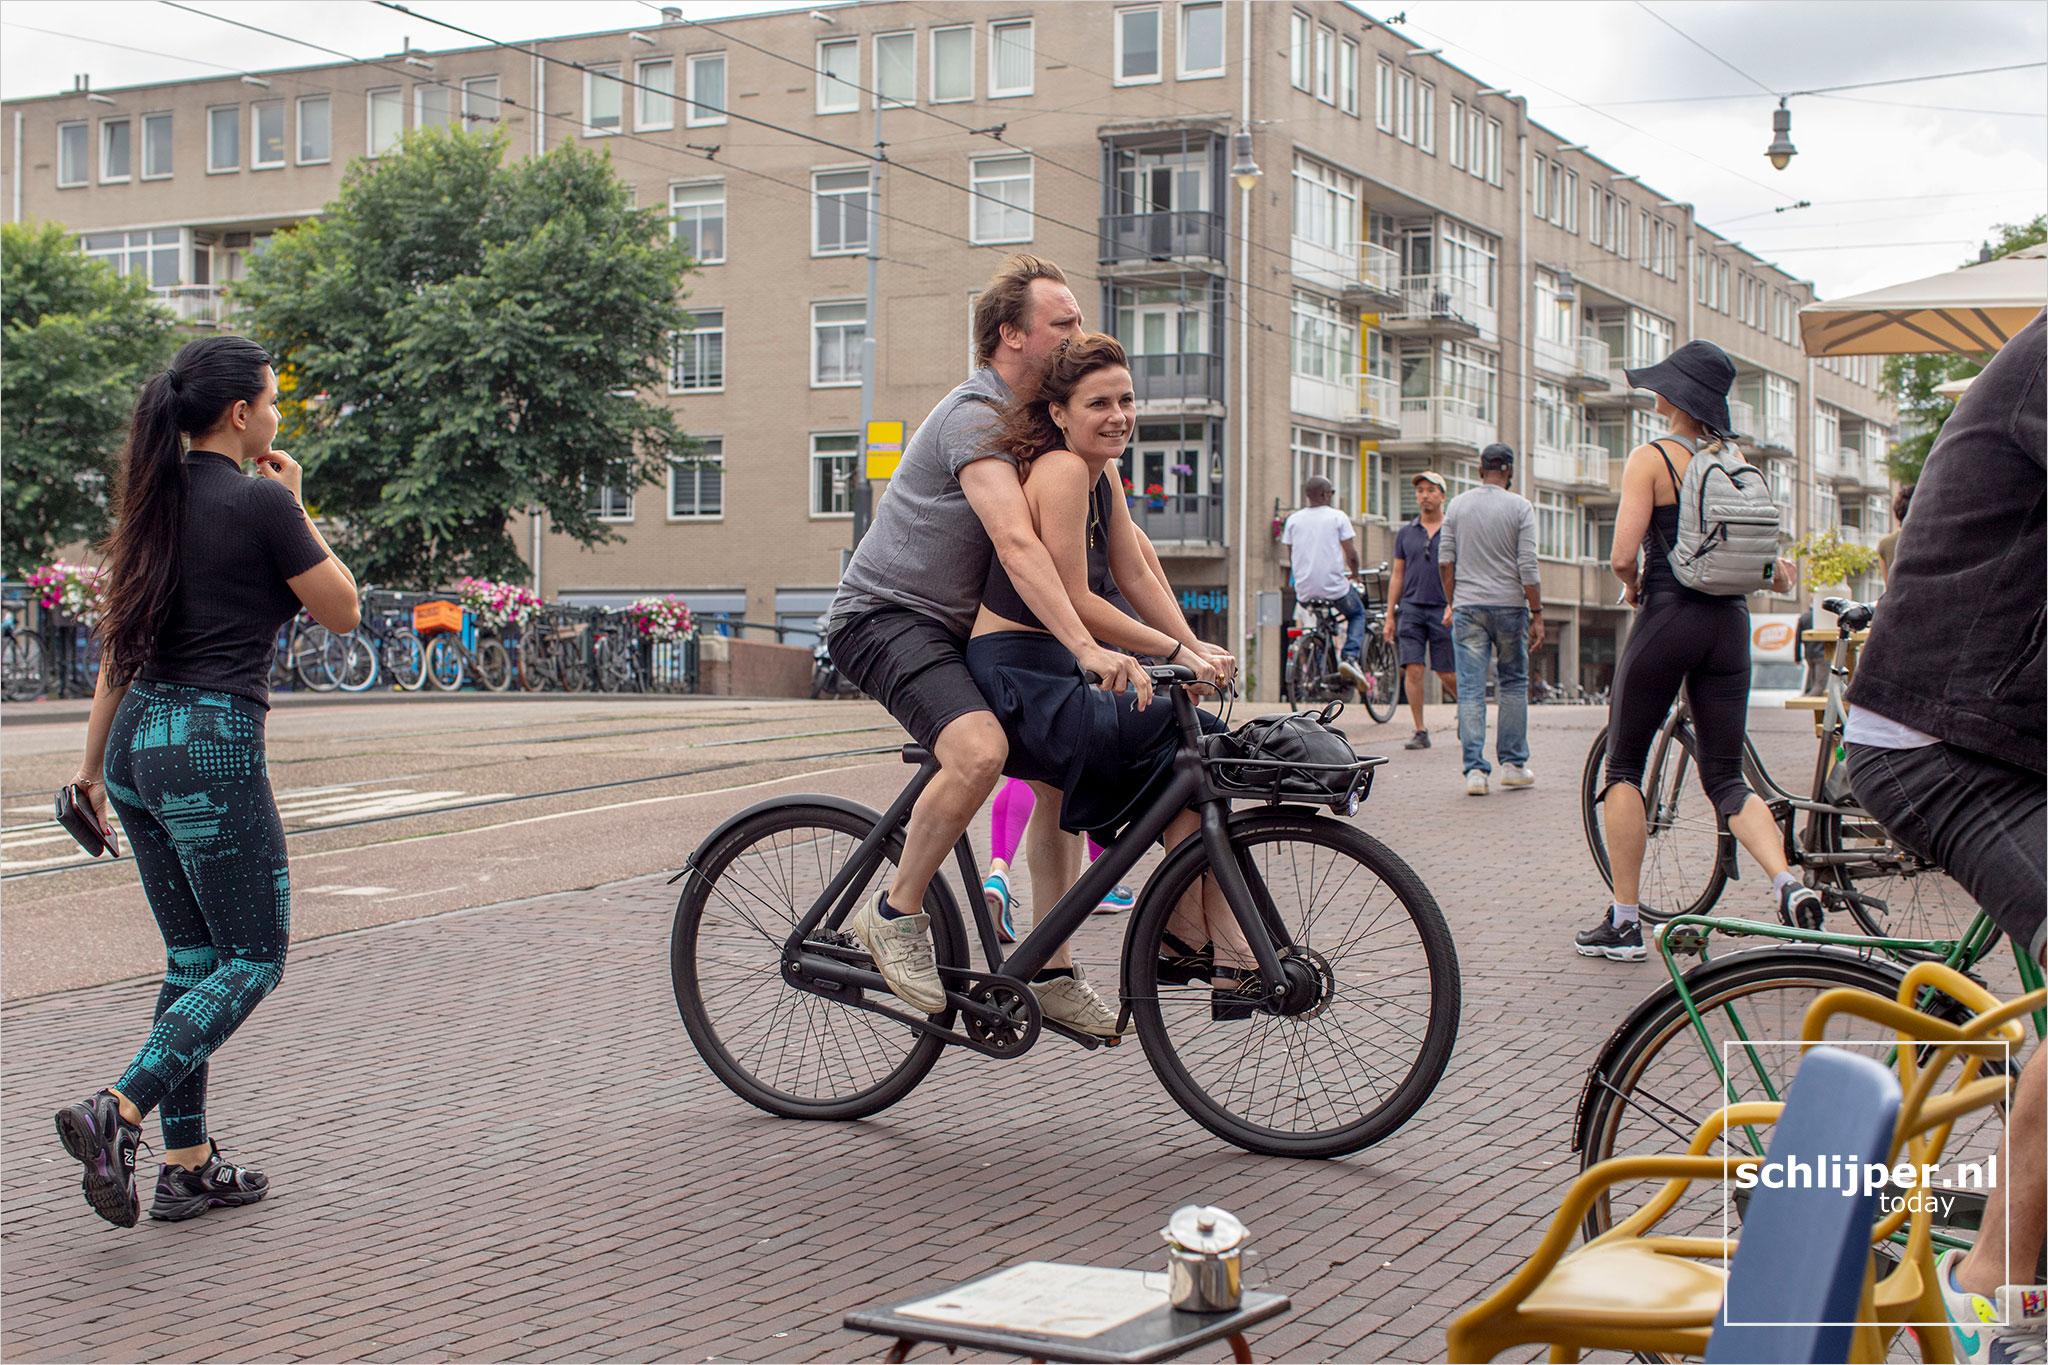 The Netherlands, Amsterdam, 4 juli 2021